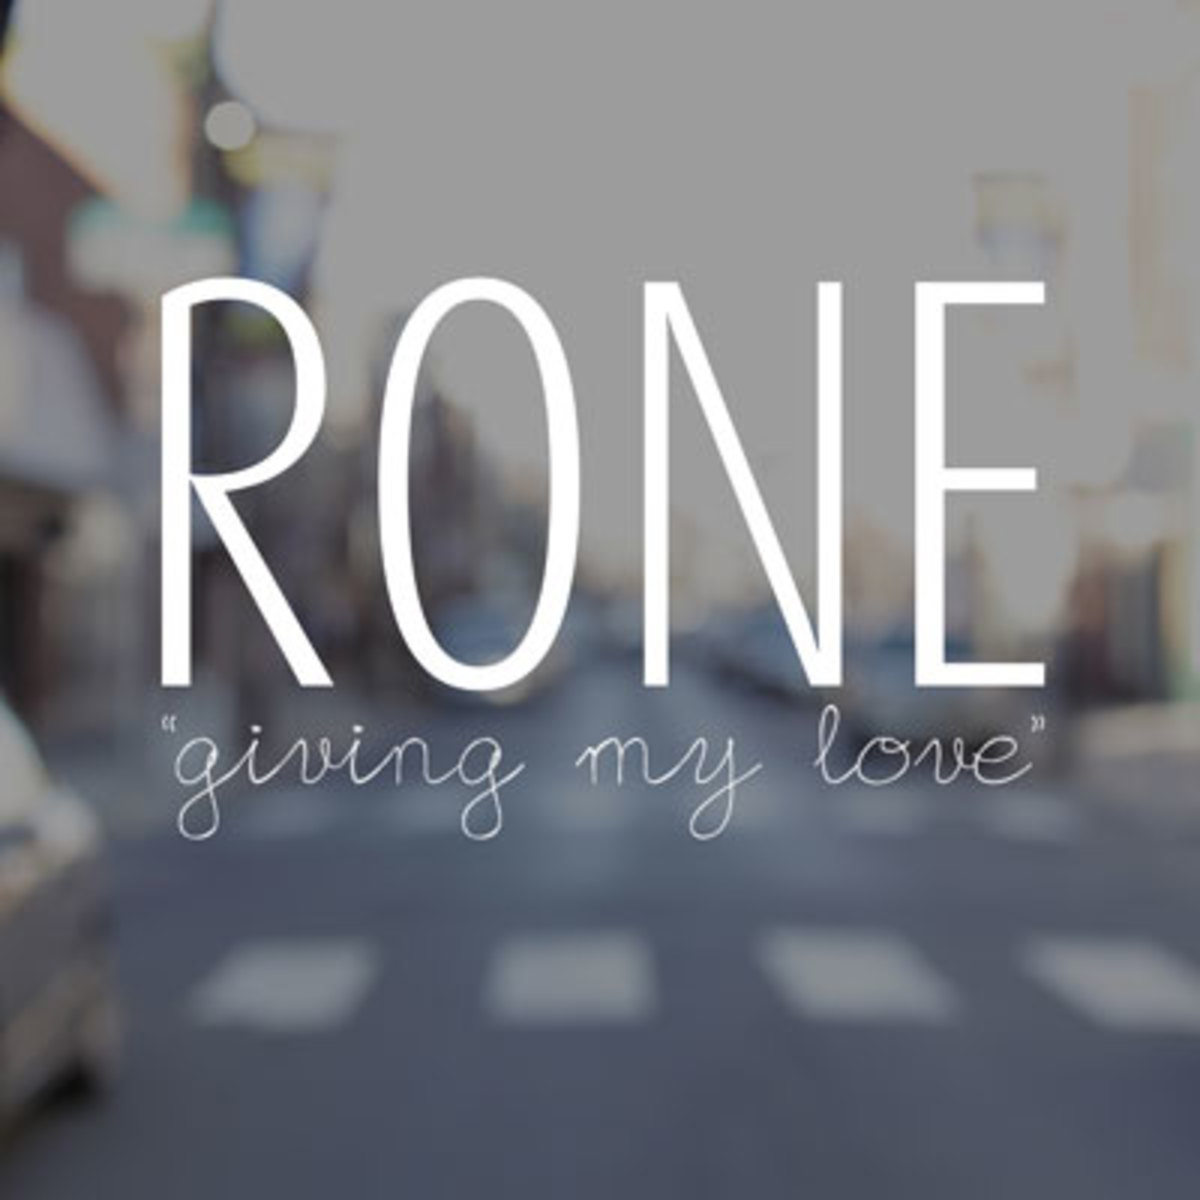 rone-givingmylove.jpg